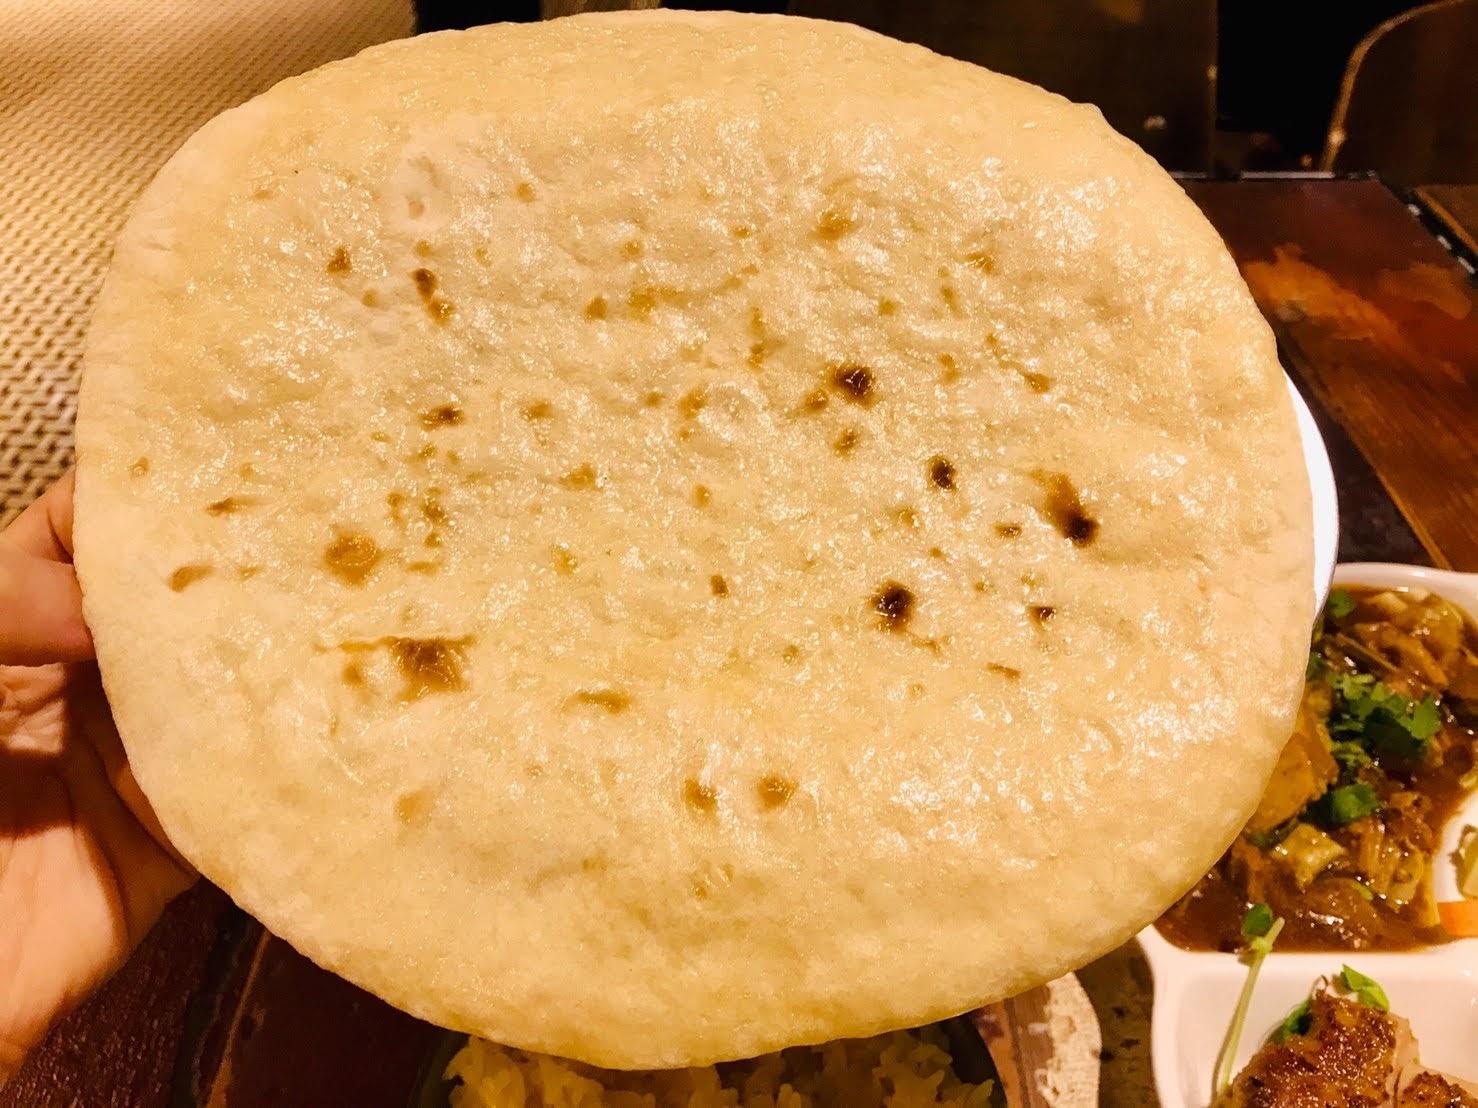 GARLIC NAAN, 印度烤餅、拉茶推薦,板橋大遠美食